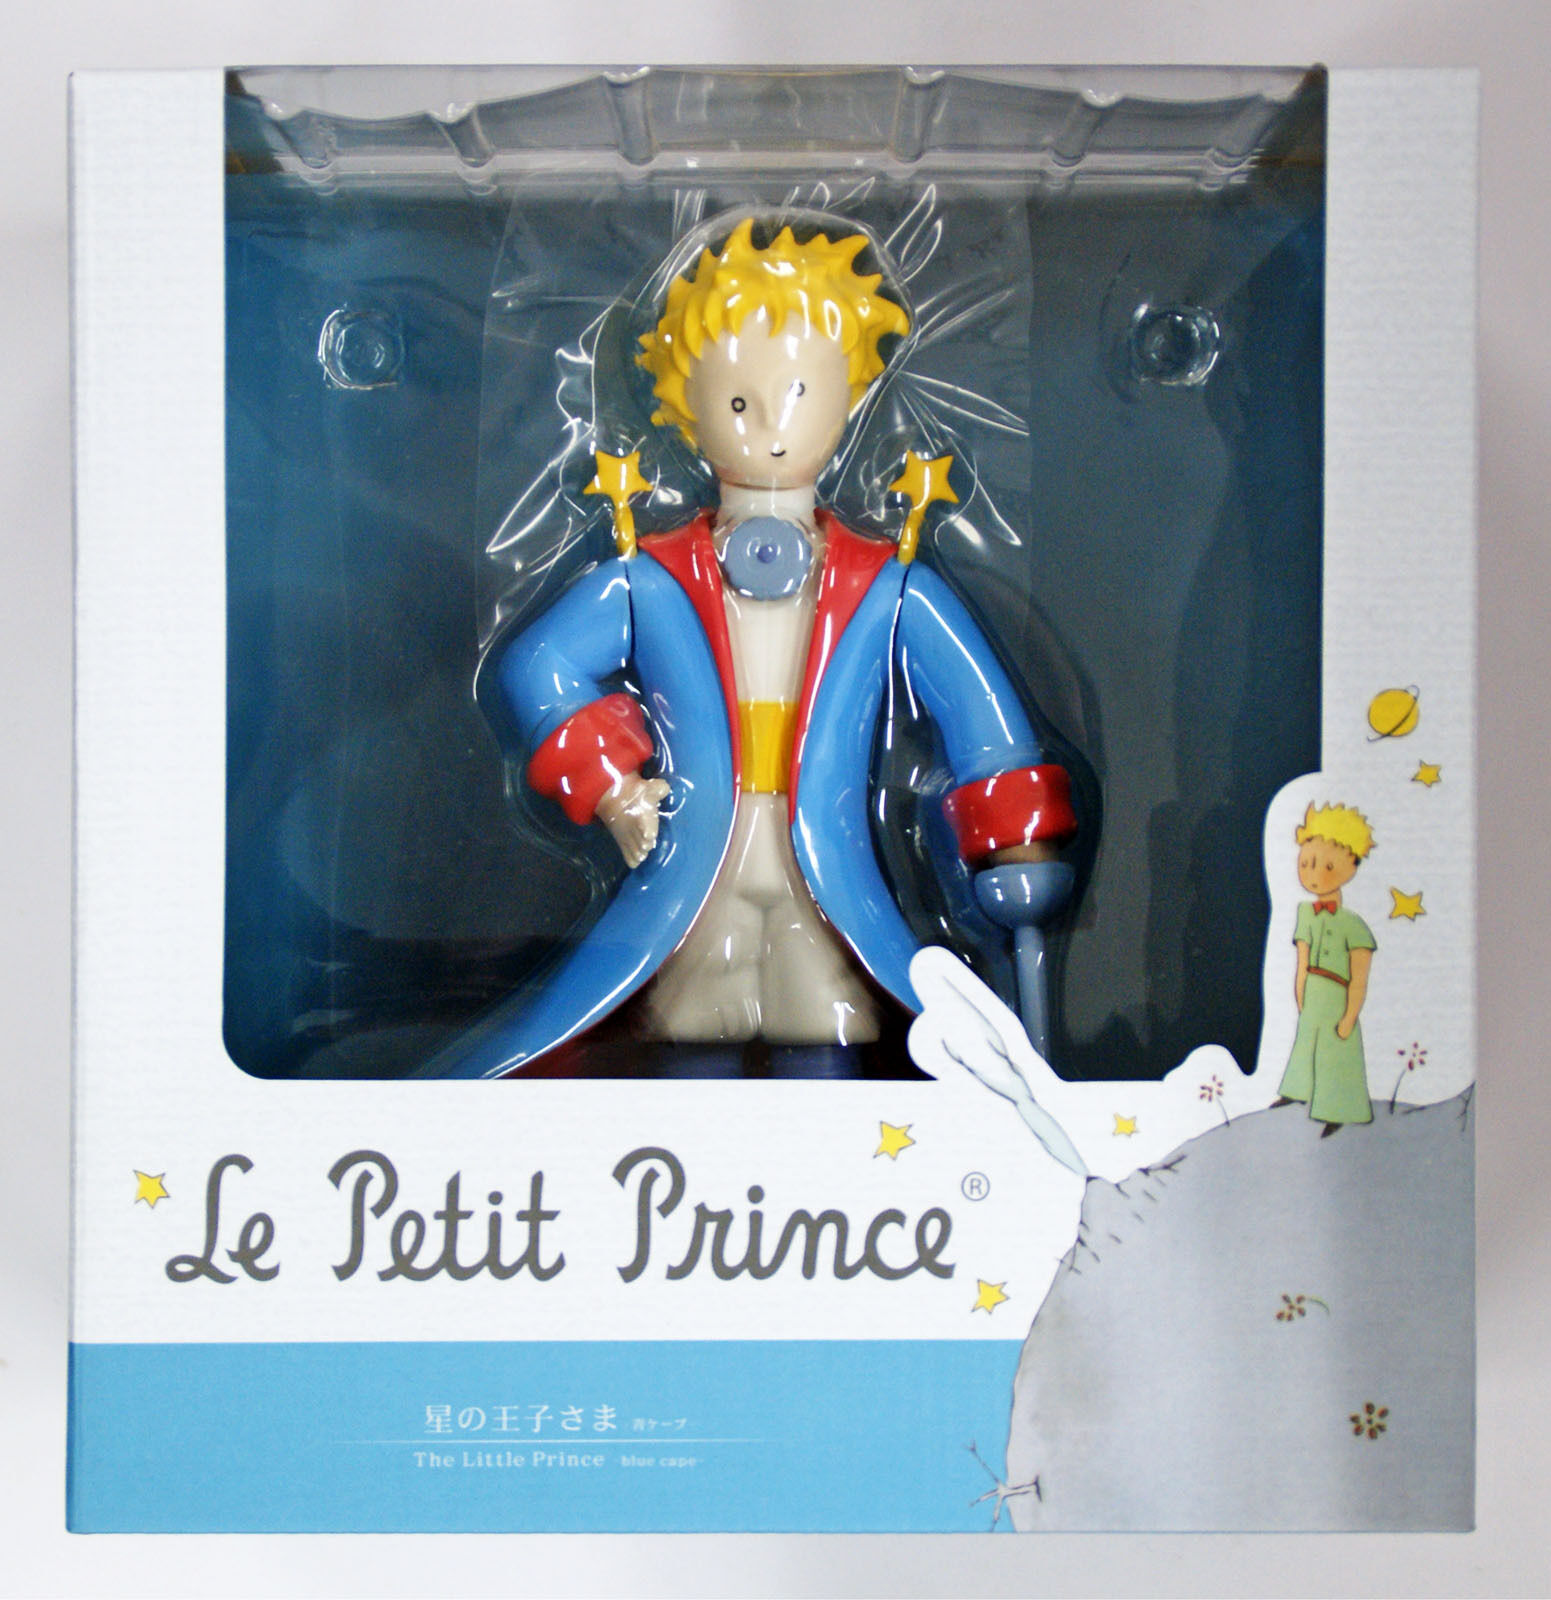 Medicom VCD-245 The Little Prince Le Petit Prince -Blau Cape- Vinyl Figure